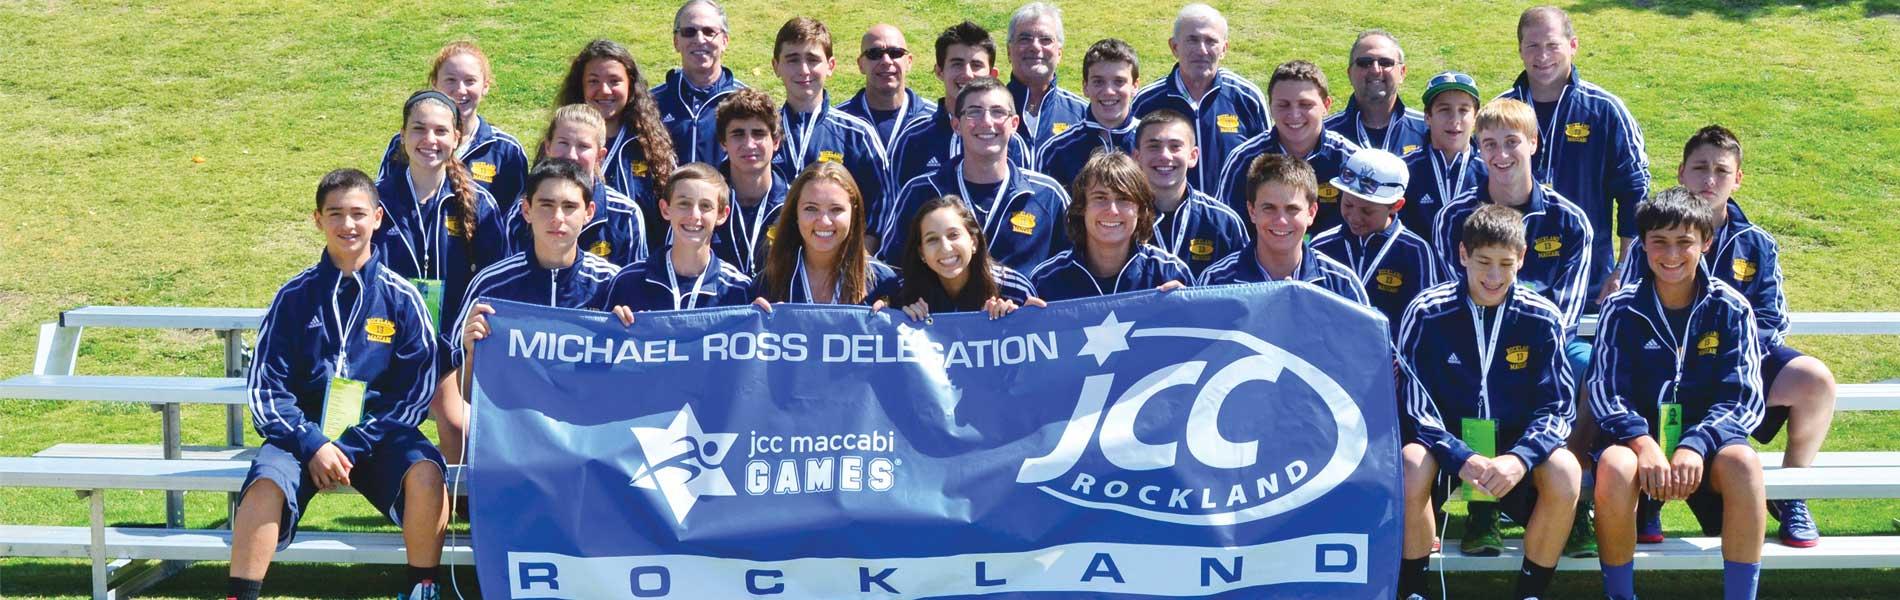 JCC Rockland Maccabi Team